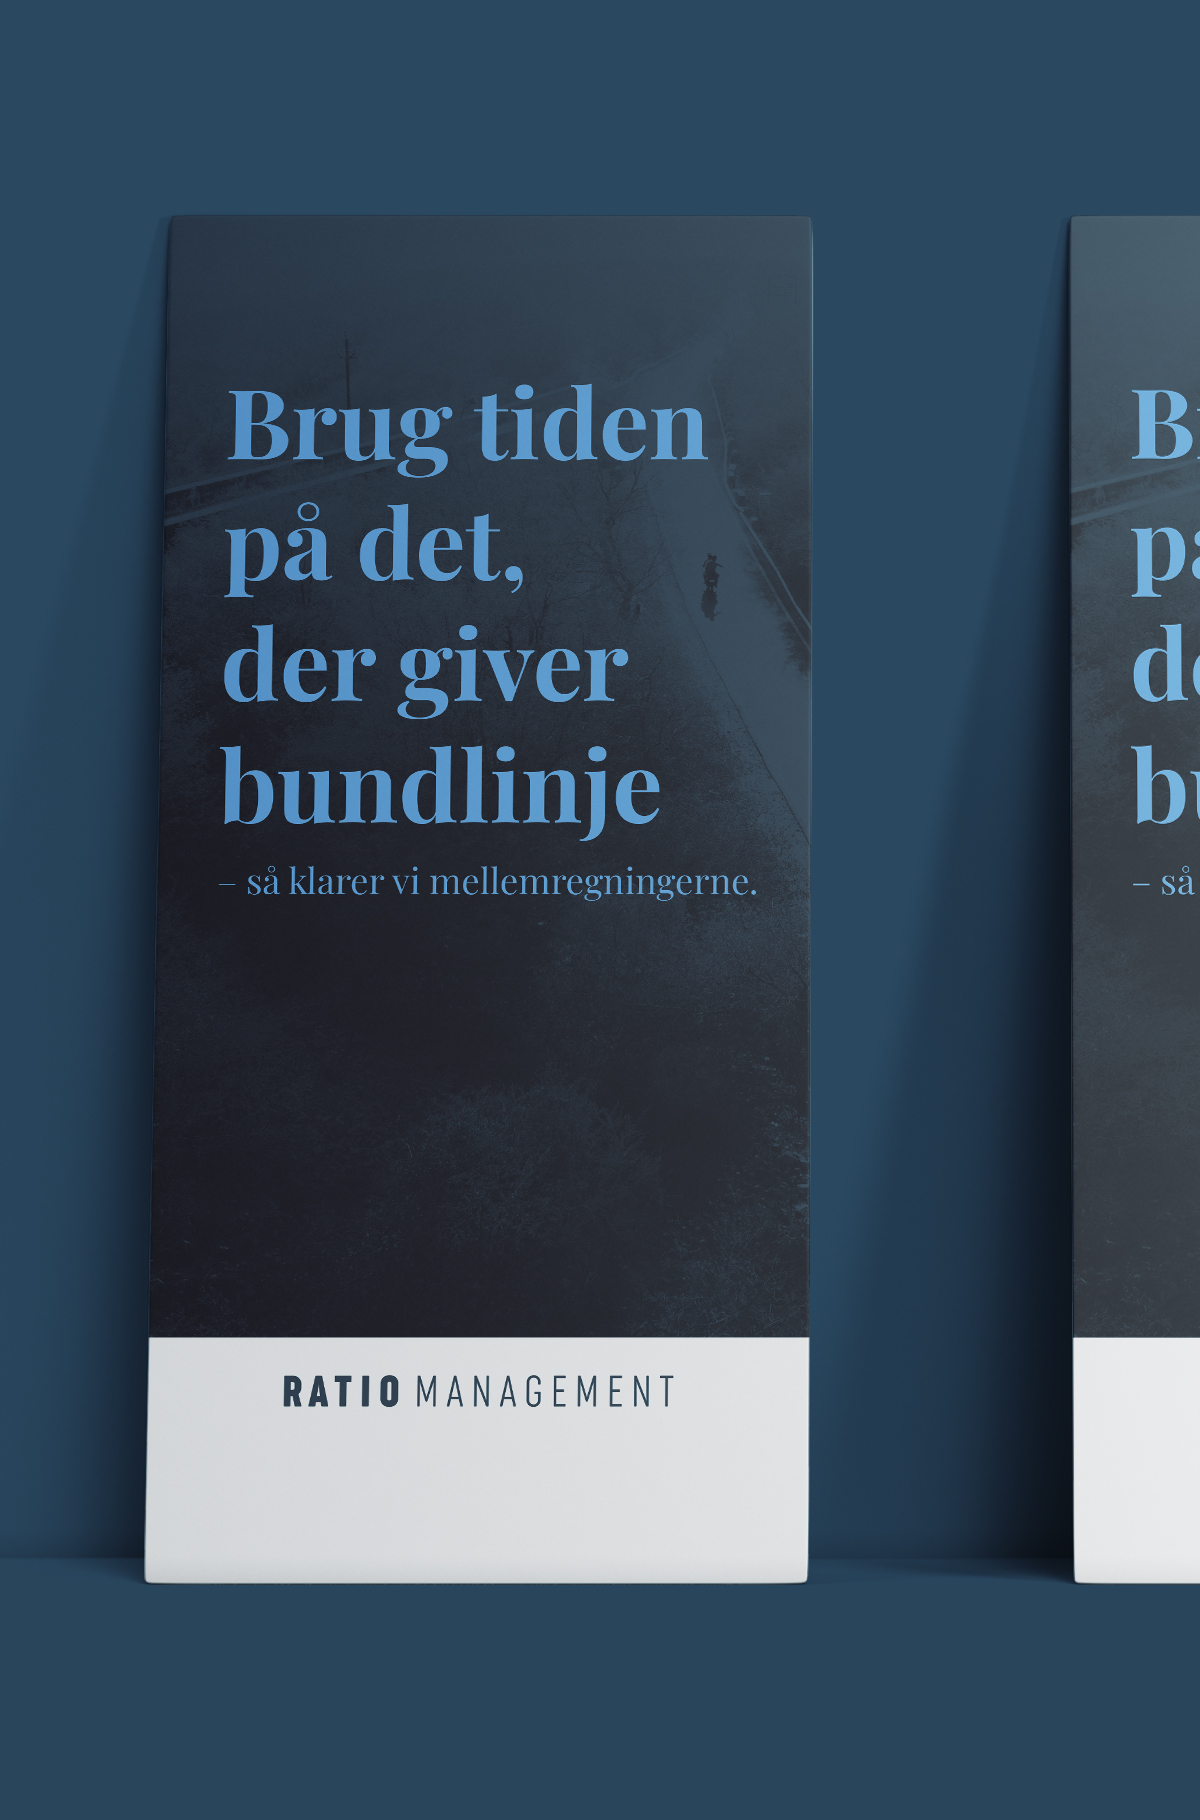 Ratio Management poster